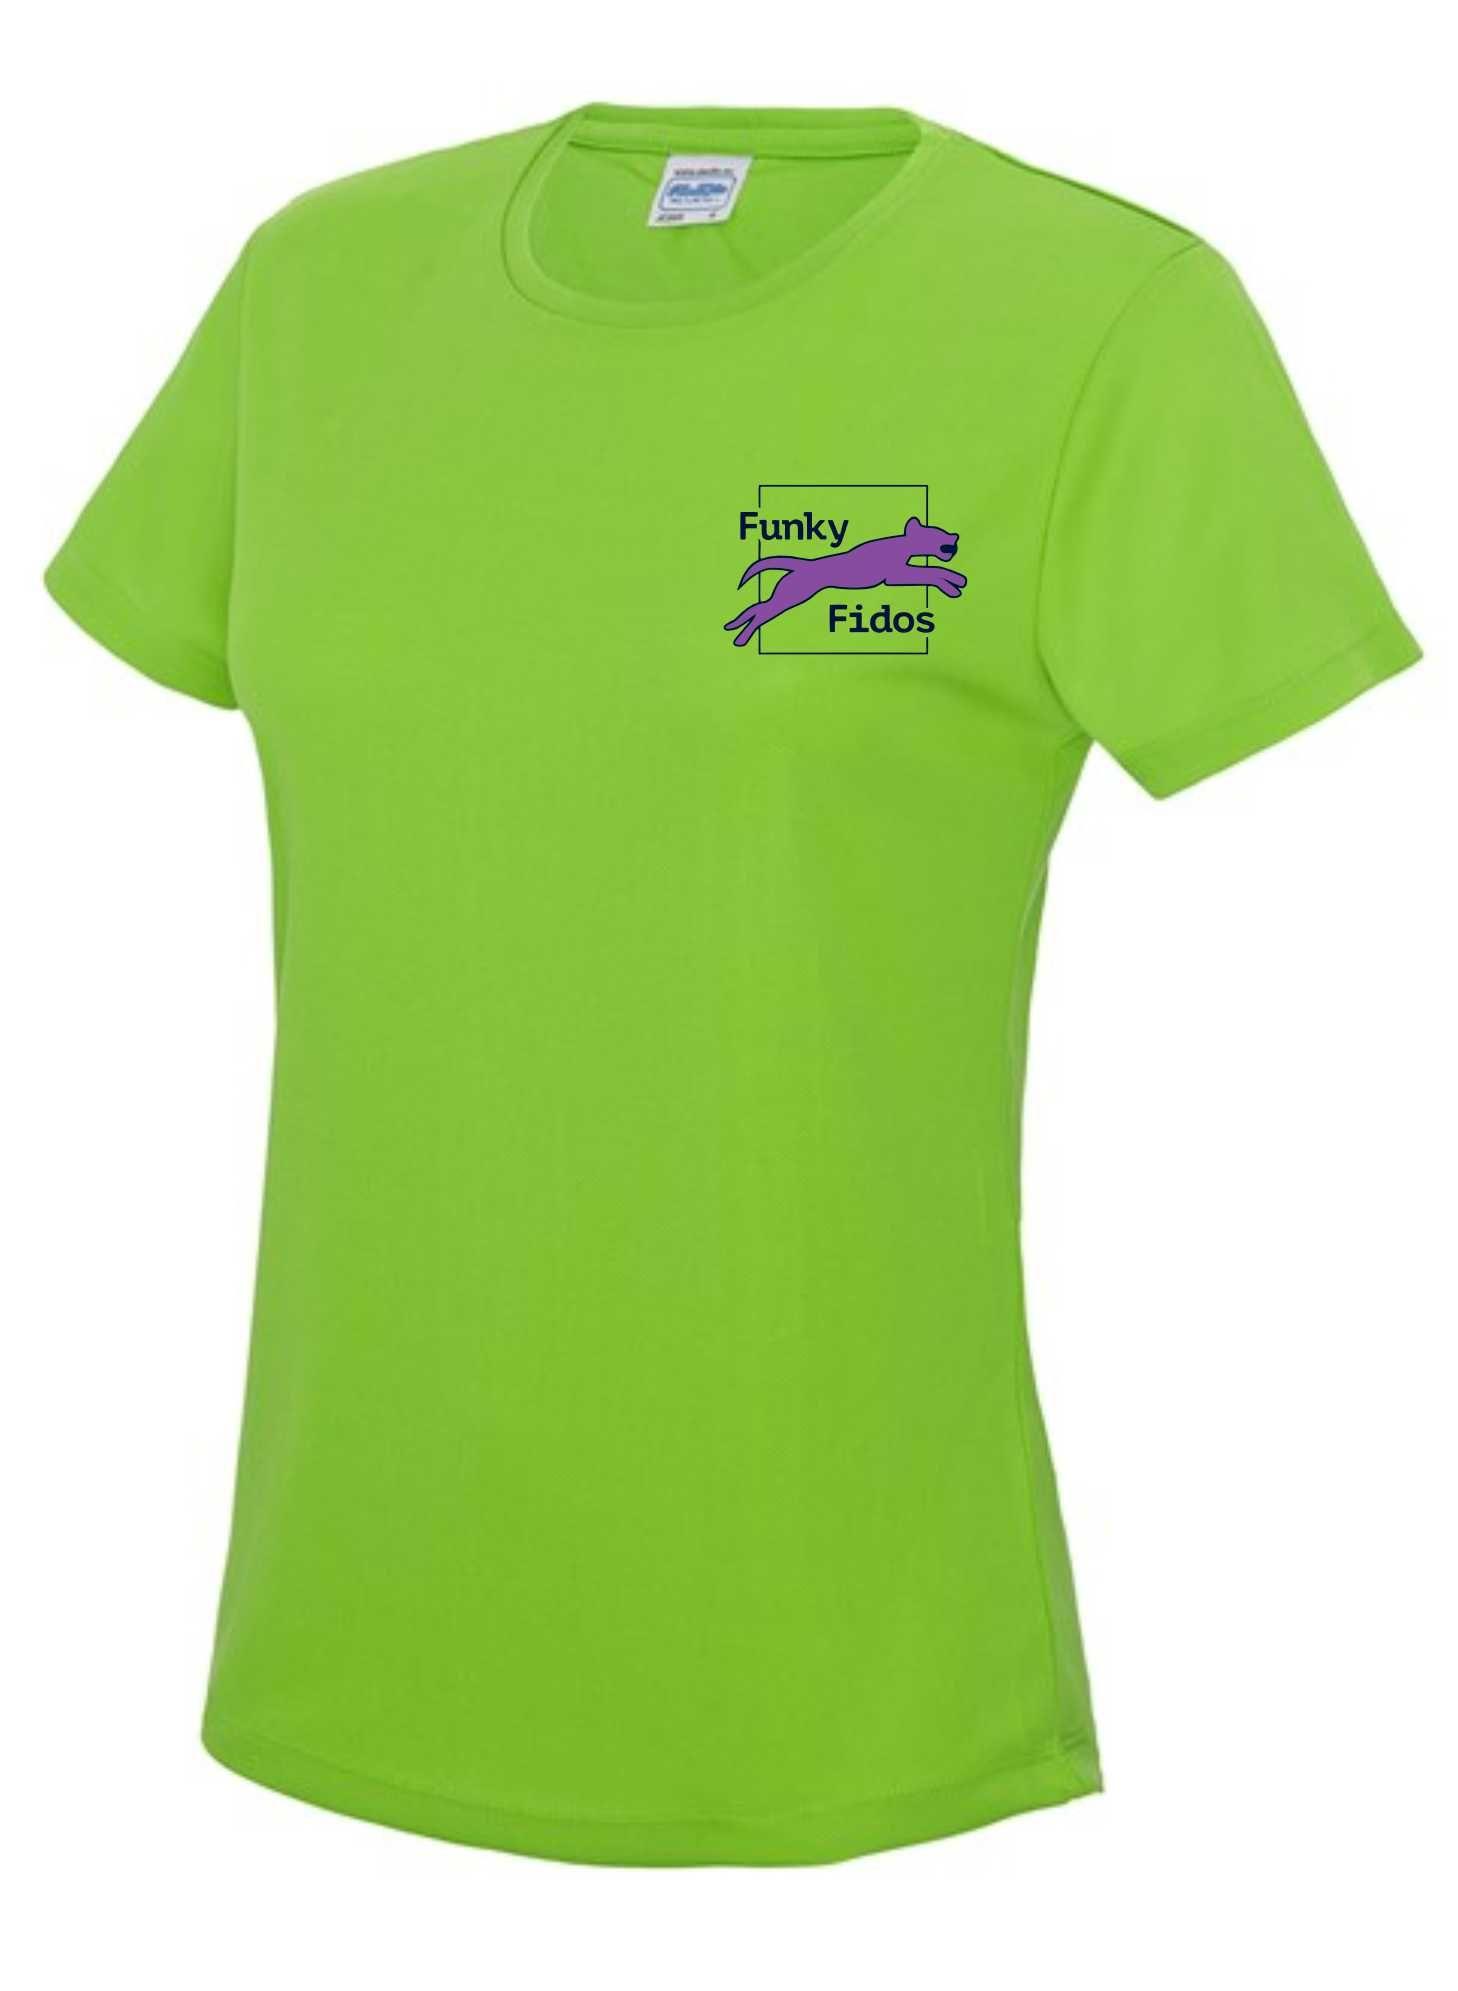 Funky Fidos – AWD Women's Cool Tee (Electric Green)